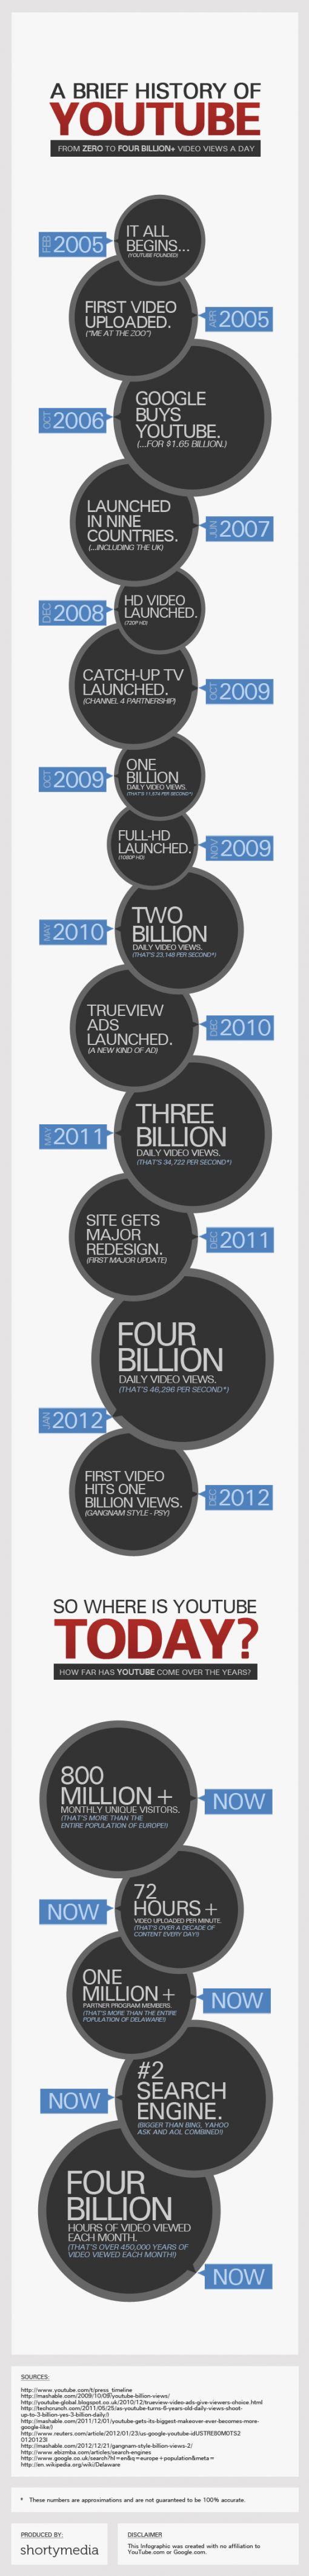 brief-history-of-youtube-infographic-shortymedia